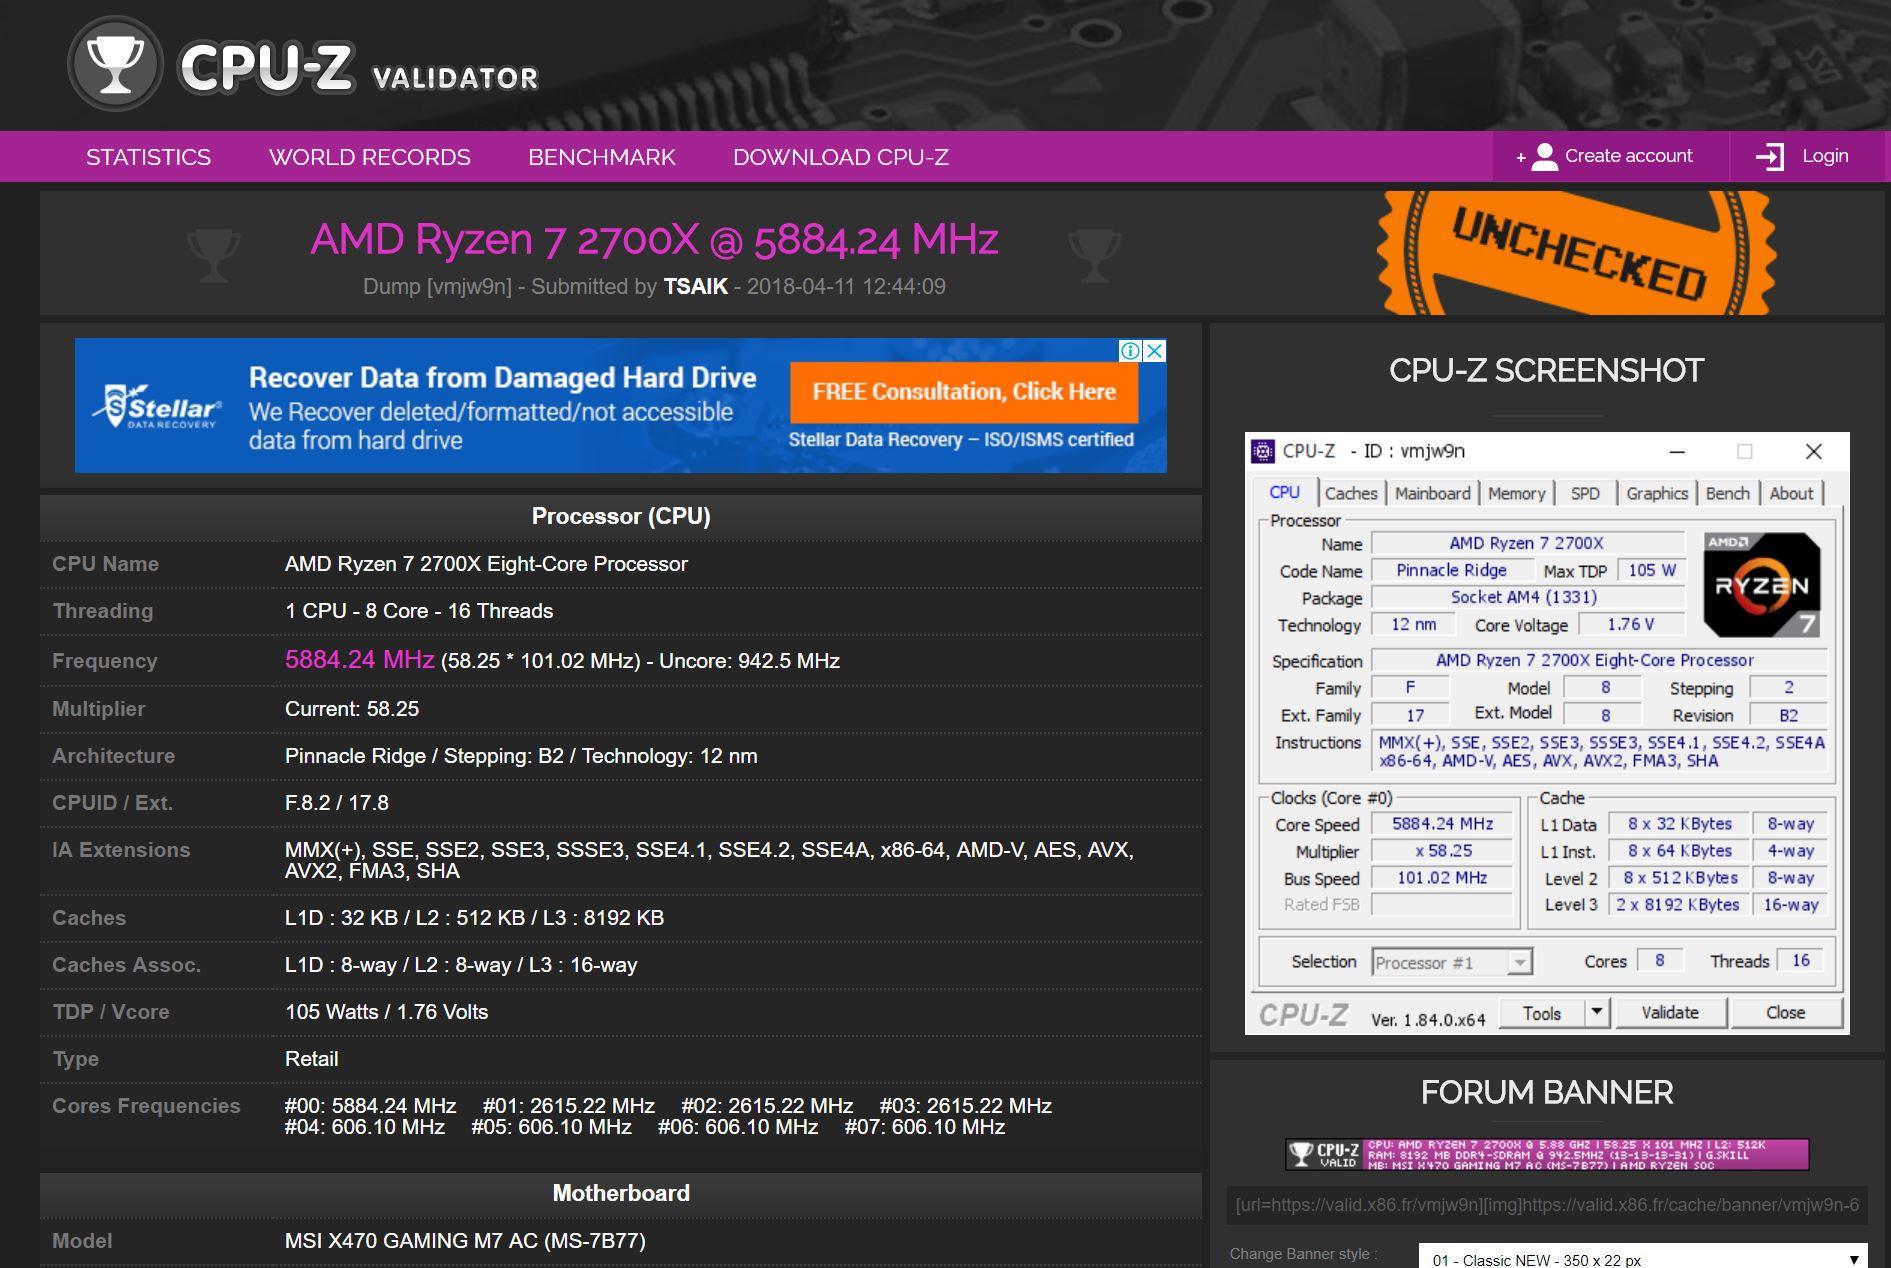 AMD Puts 2nd Gen Ryzen CPUs Up for Pre-Order, Ships Next Week